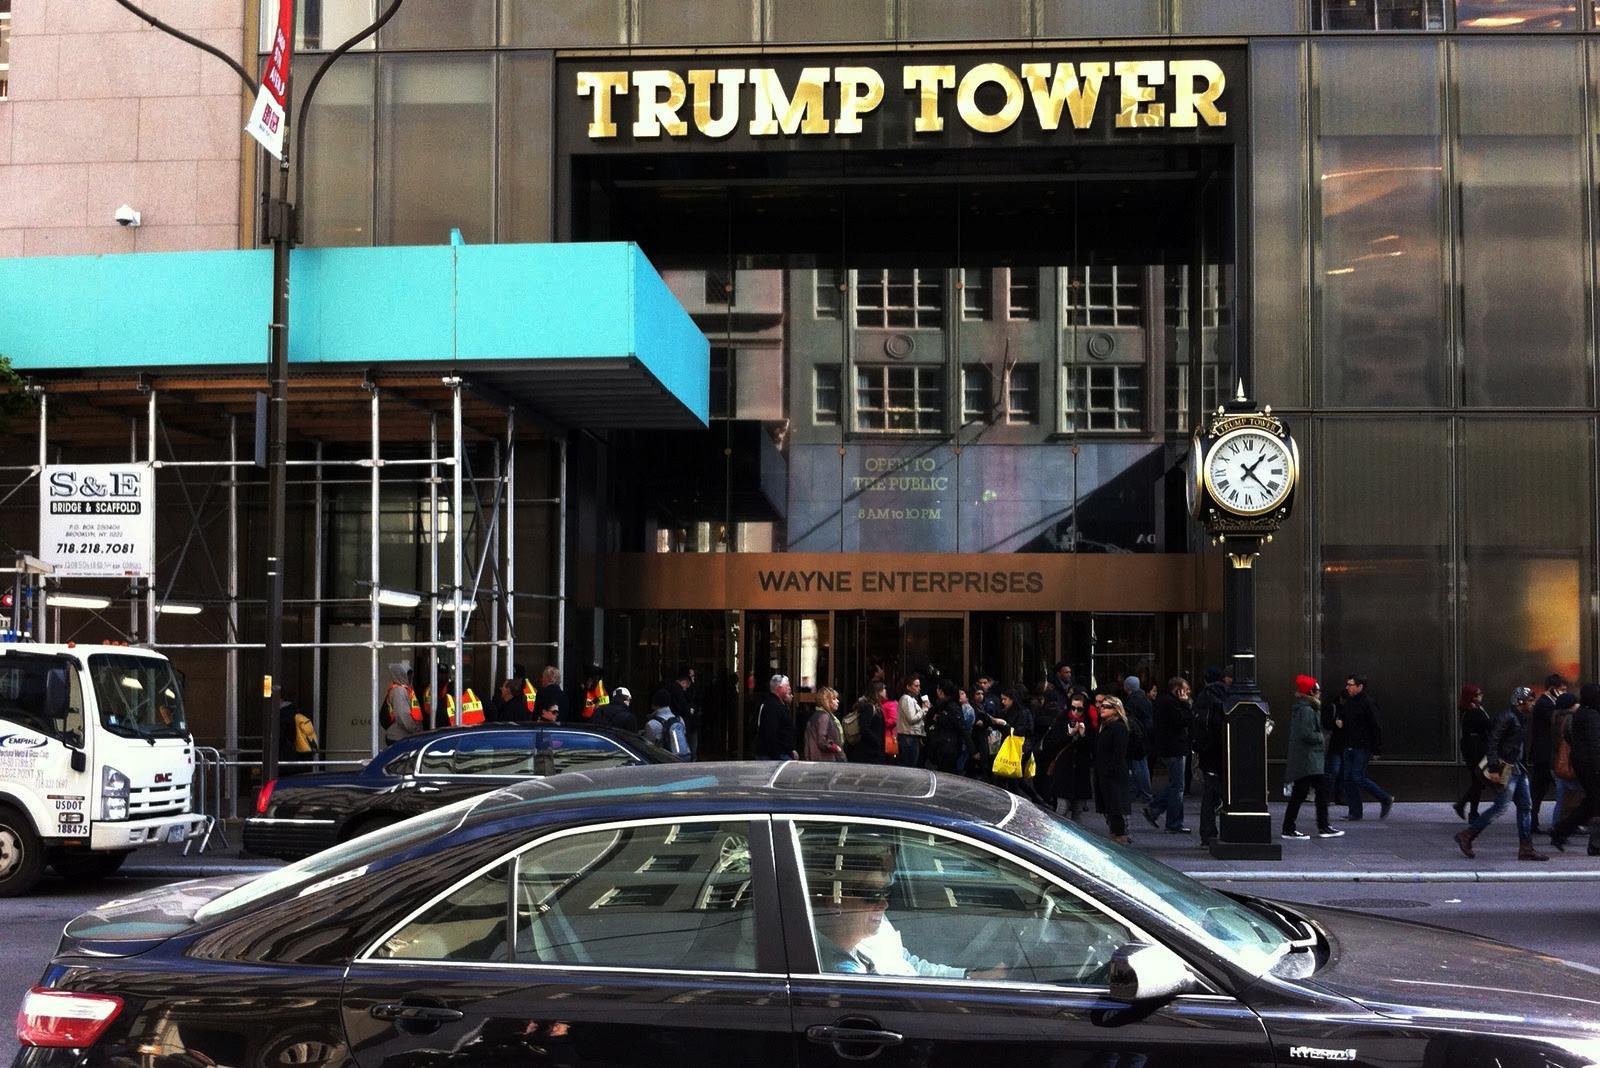 nova-york-super-herois-trump-tower-virou-wayne-enterprises-nas-gravacoes-do-batman-em-2011